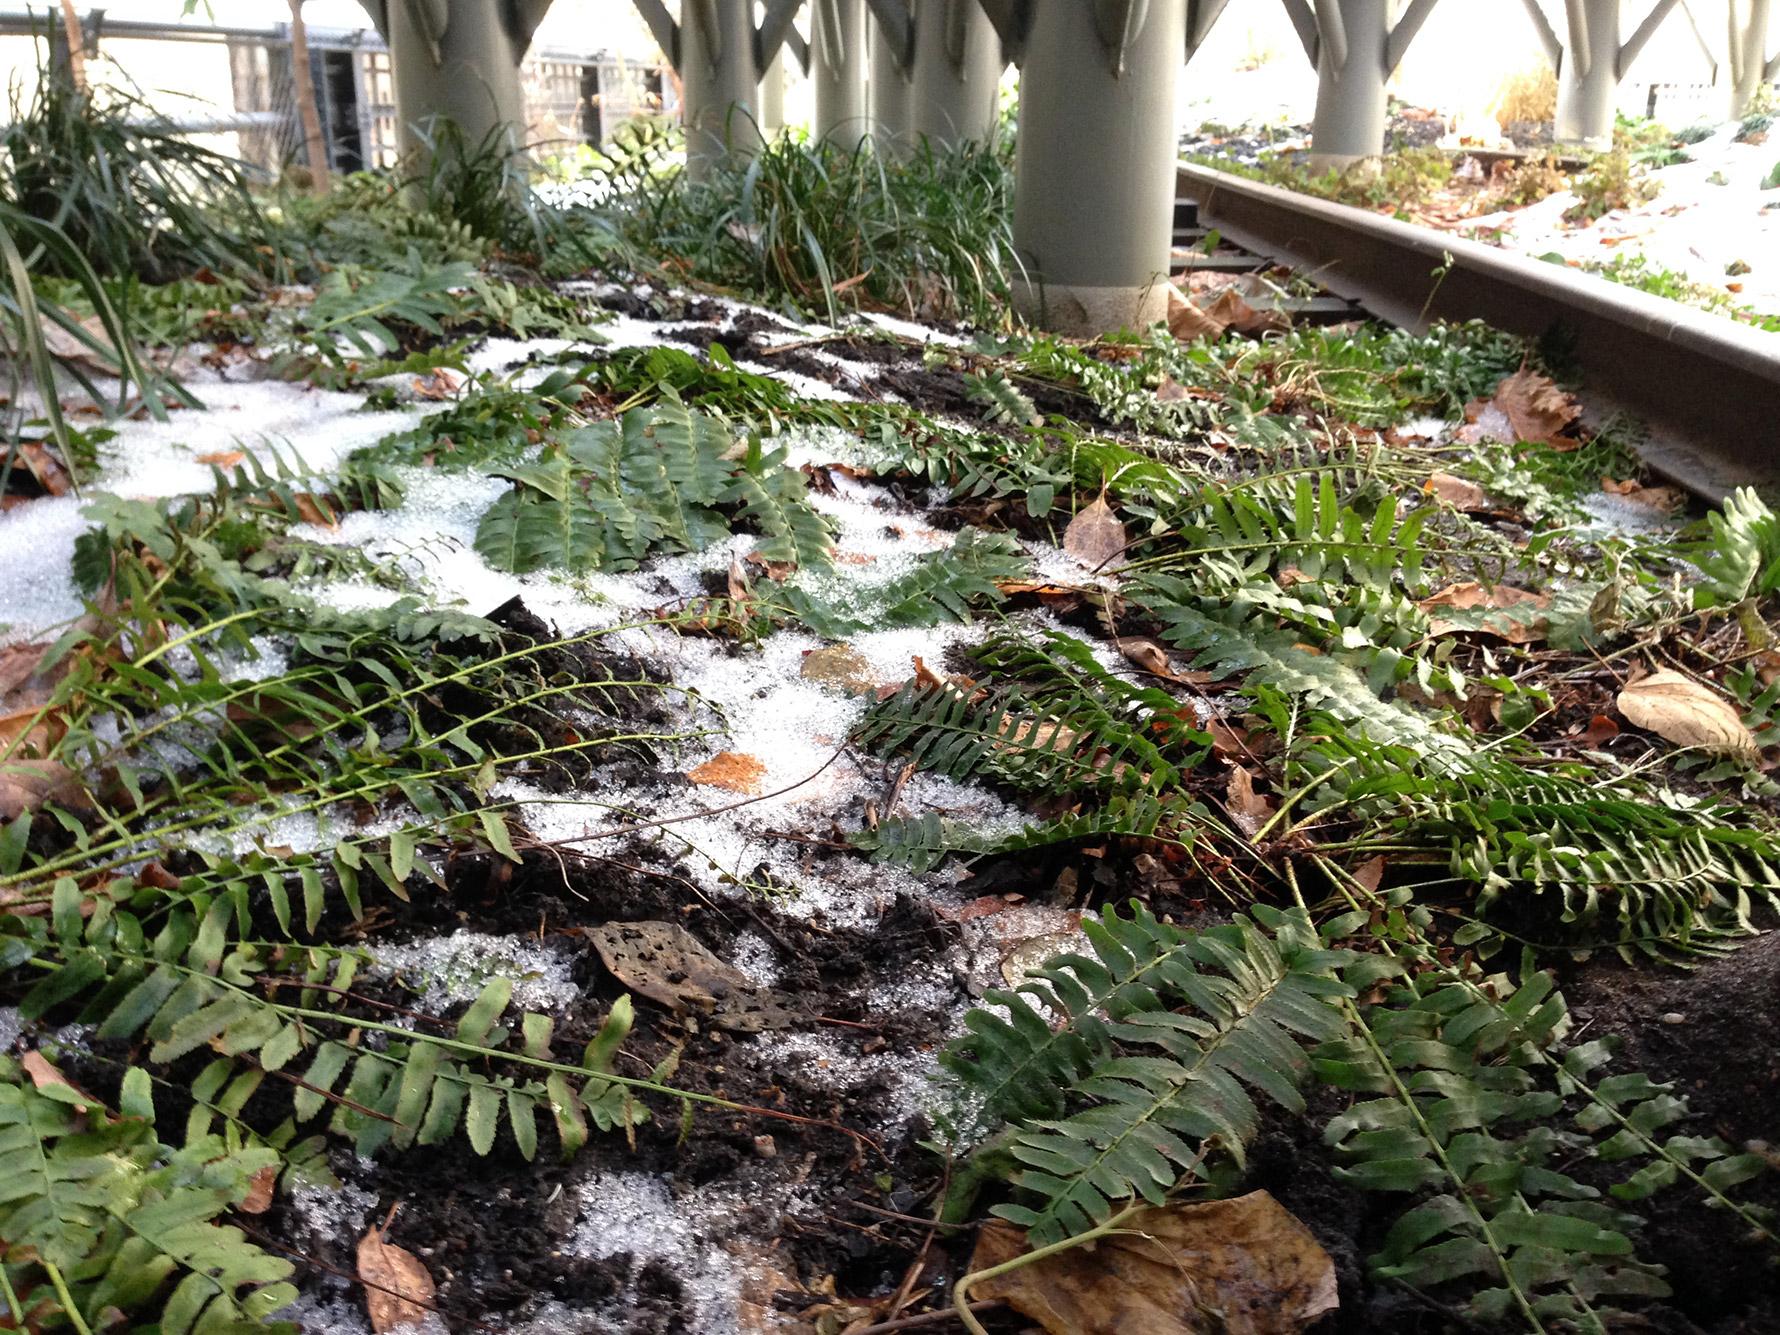 Snow on ferns on the ground